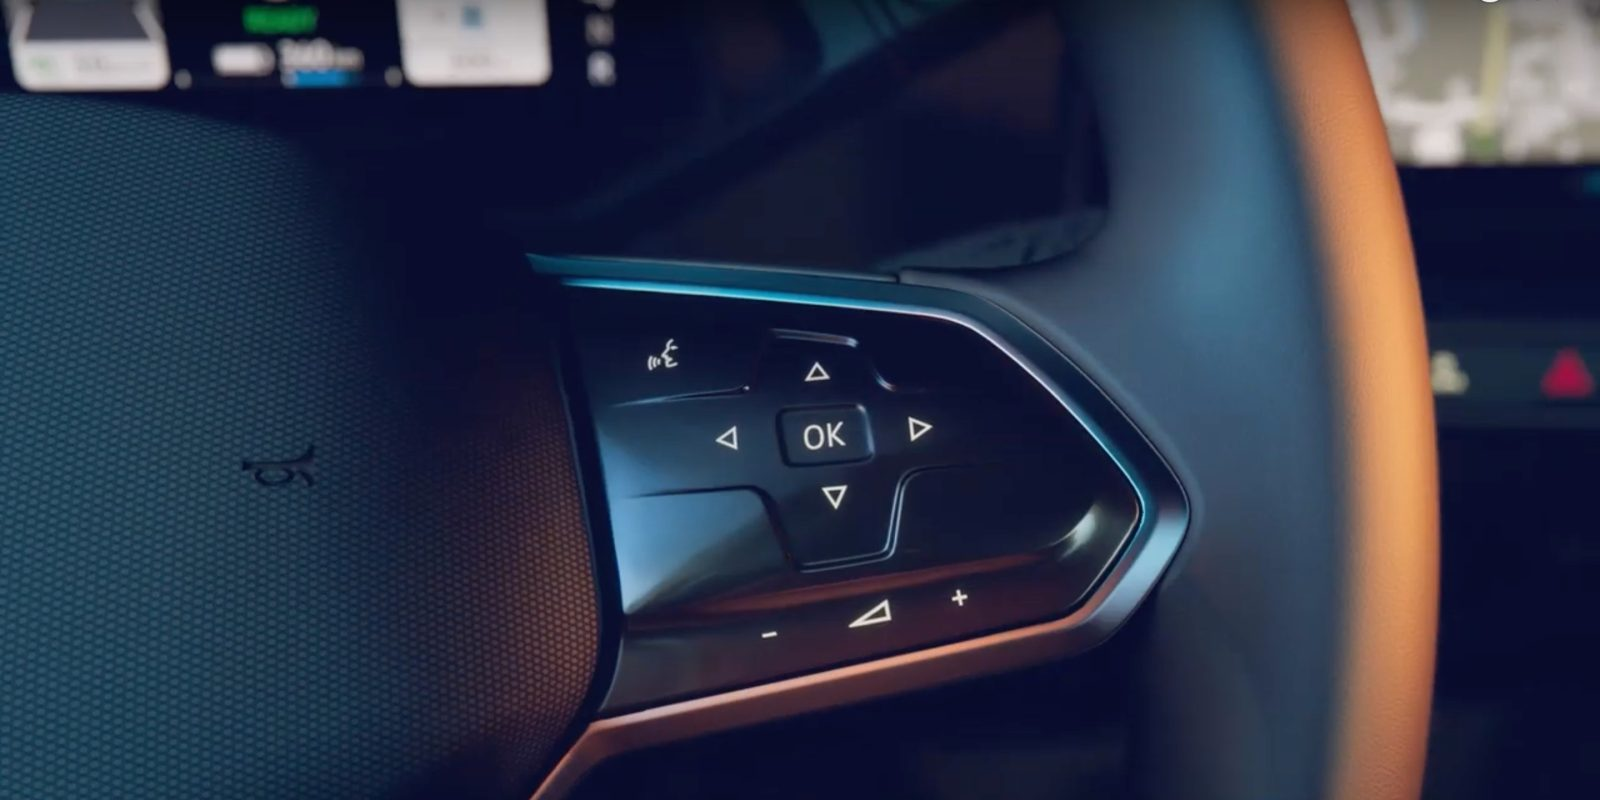 Volkswagen shows ID.3 electric hatchback's dashboard in new teaser video